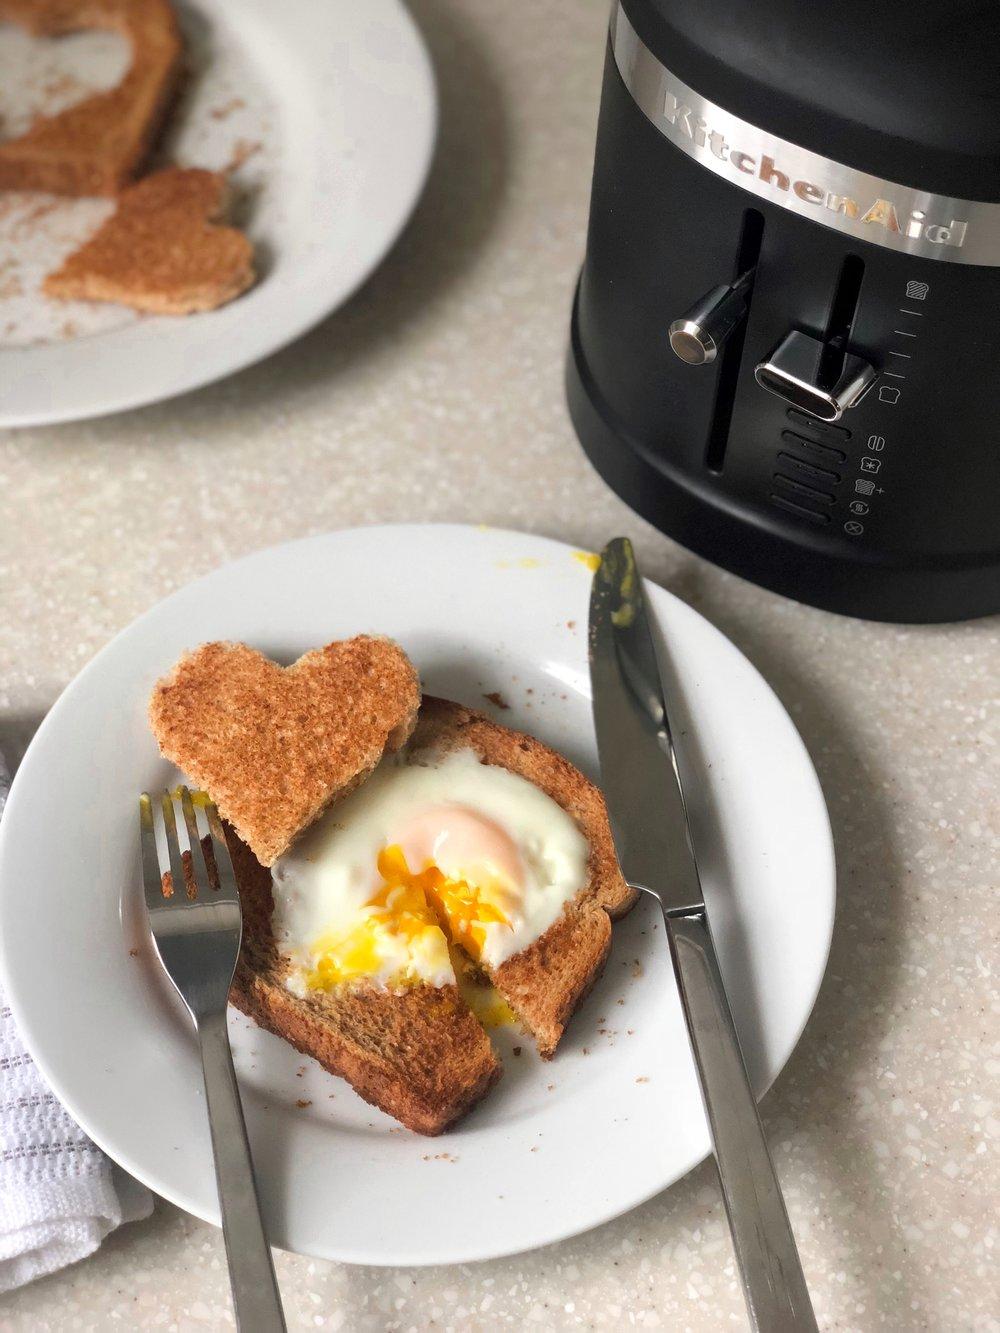 Wake up with Nebraska Furniture Mart, Egg in a Heart Recipe